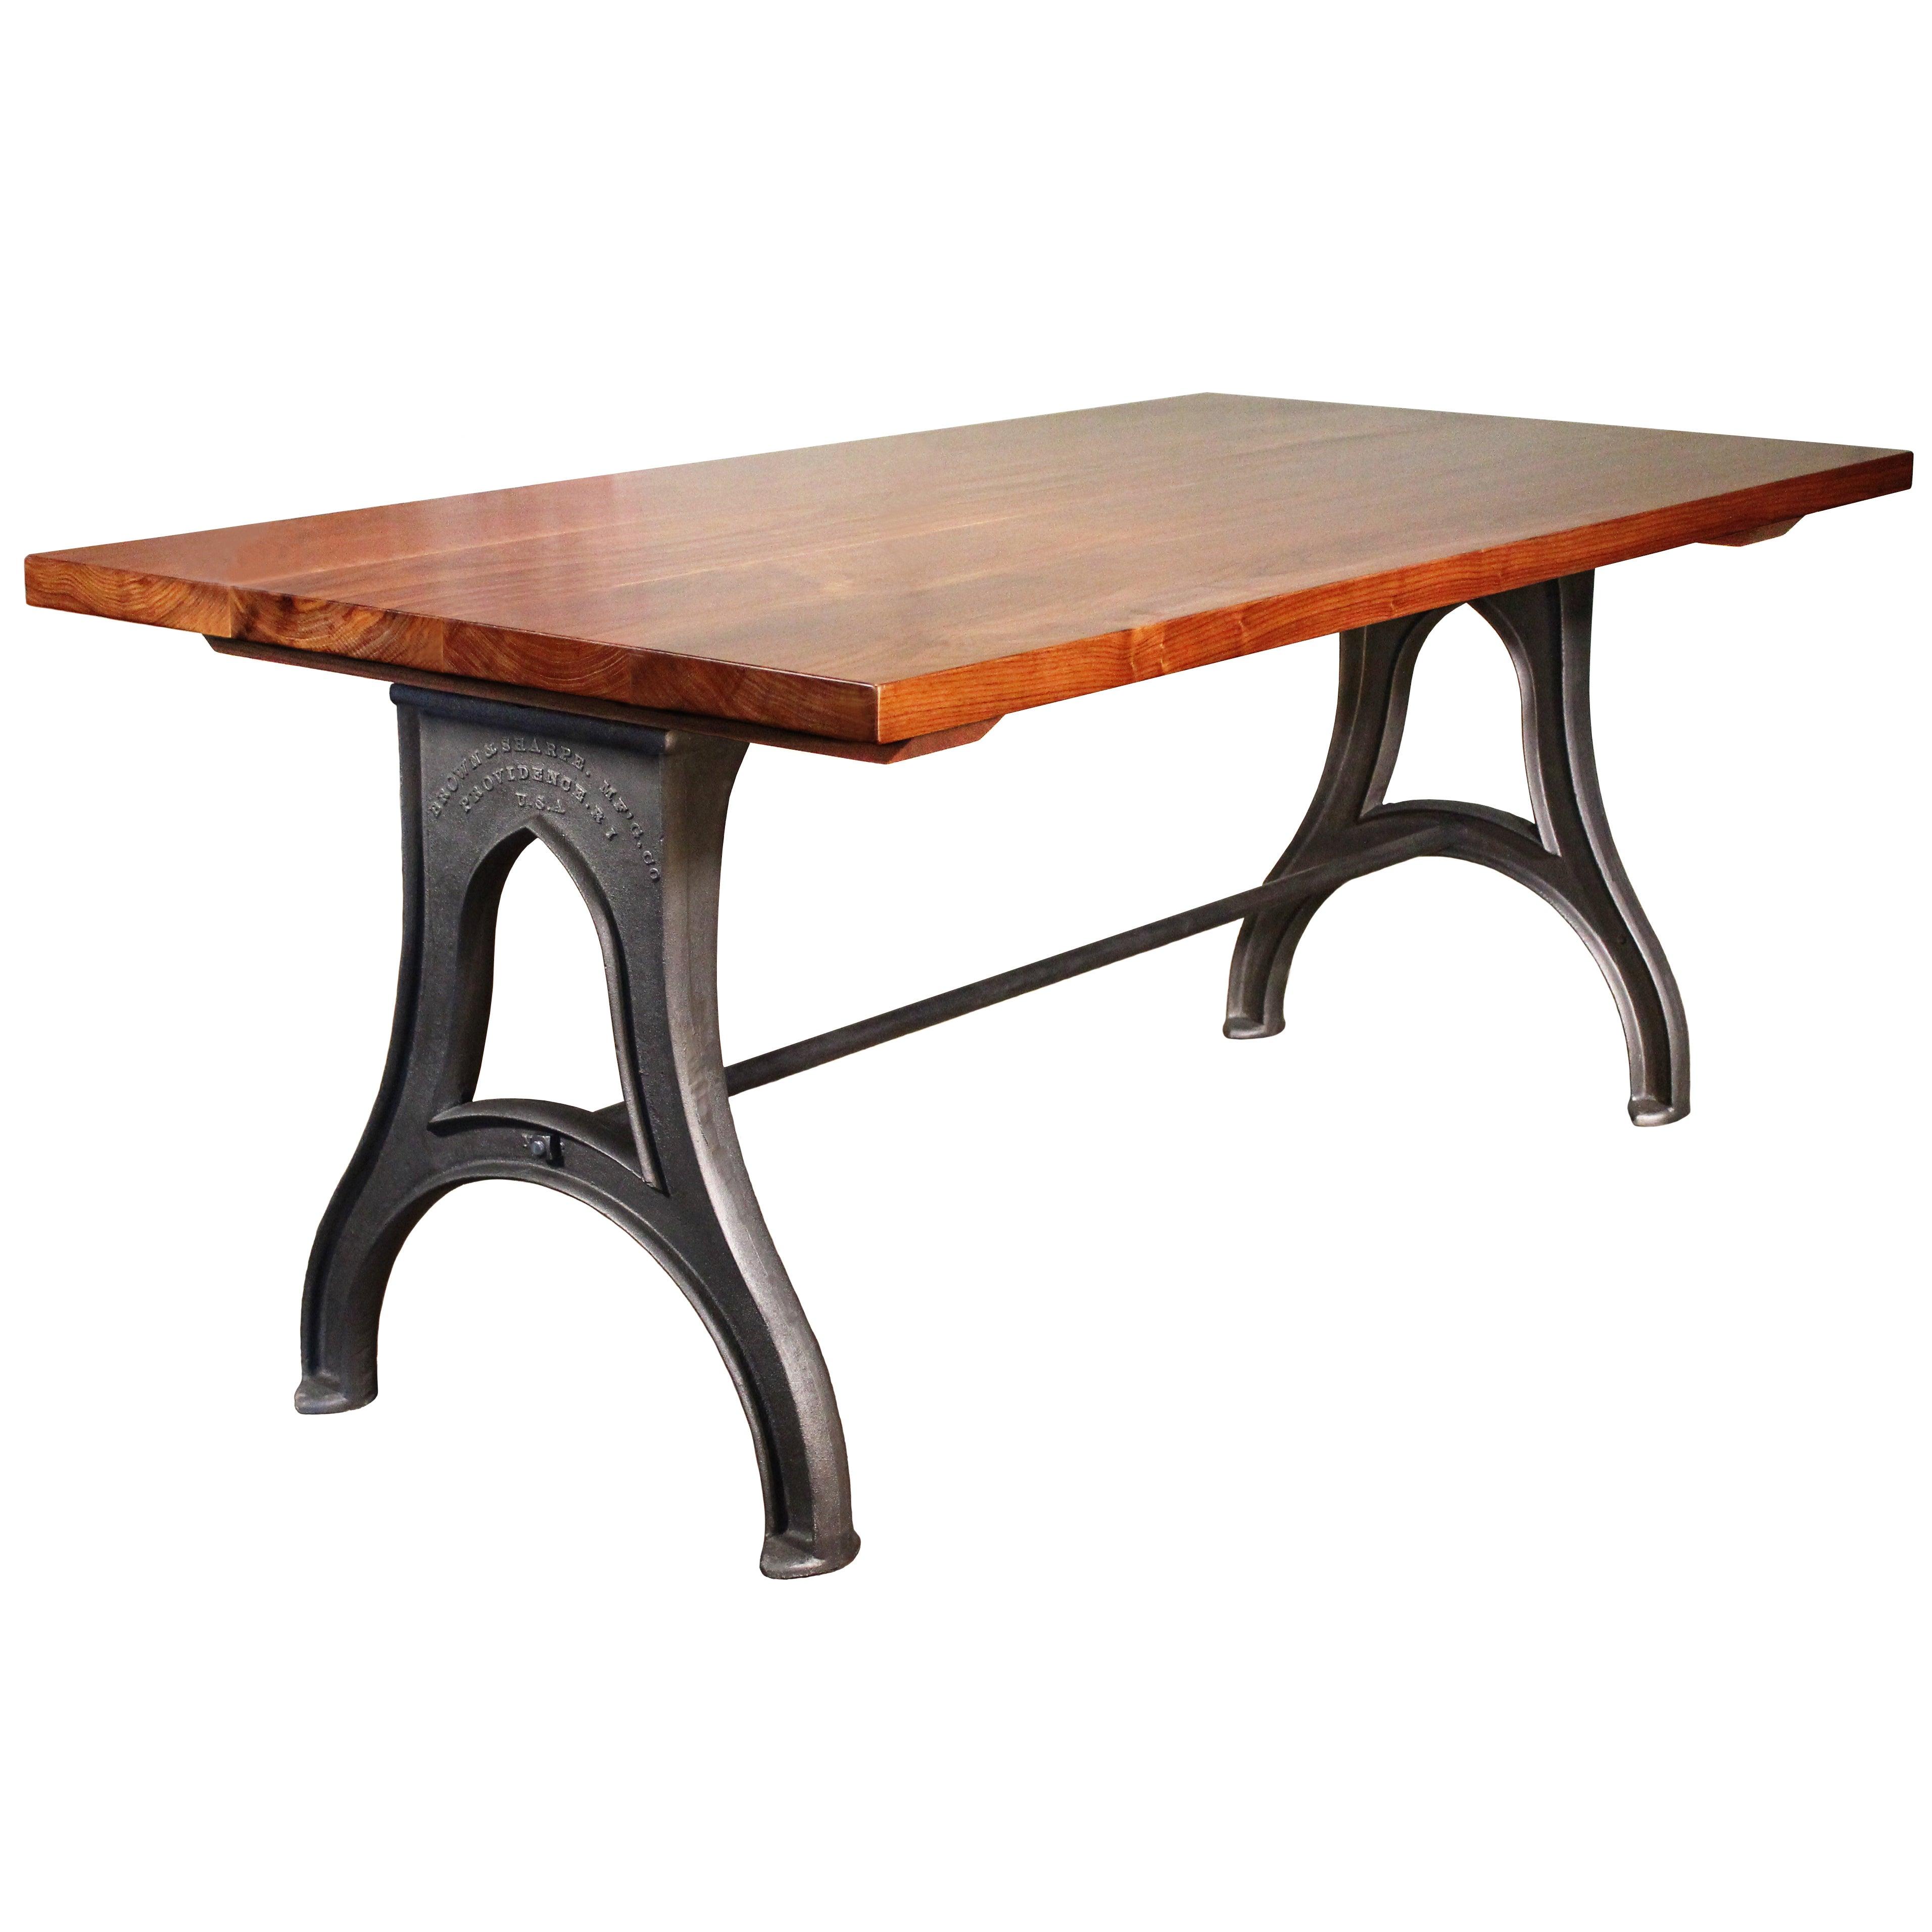 Bespoke Walnut Desk With Cast Iron Legs